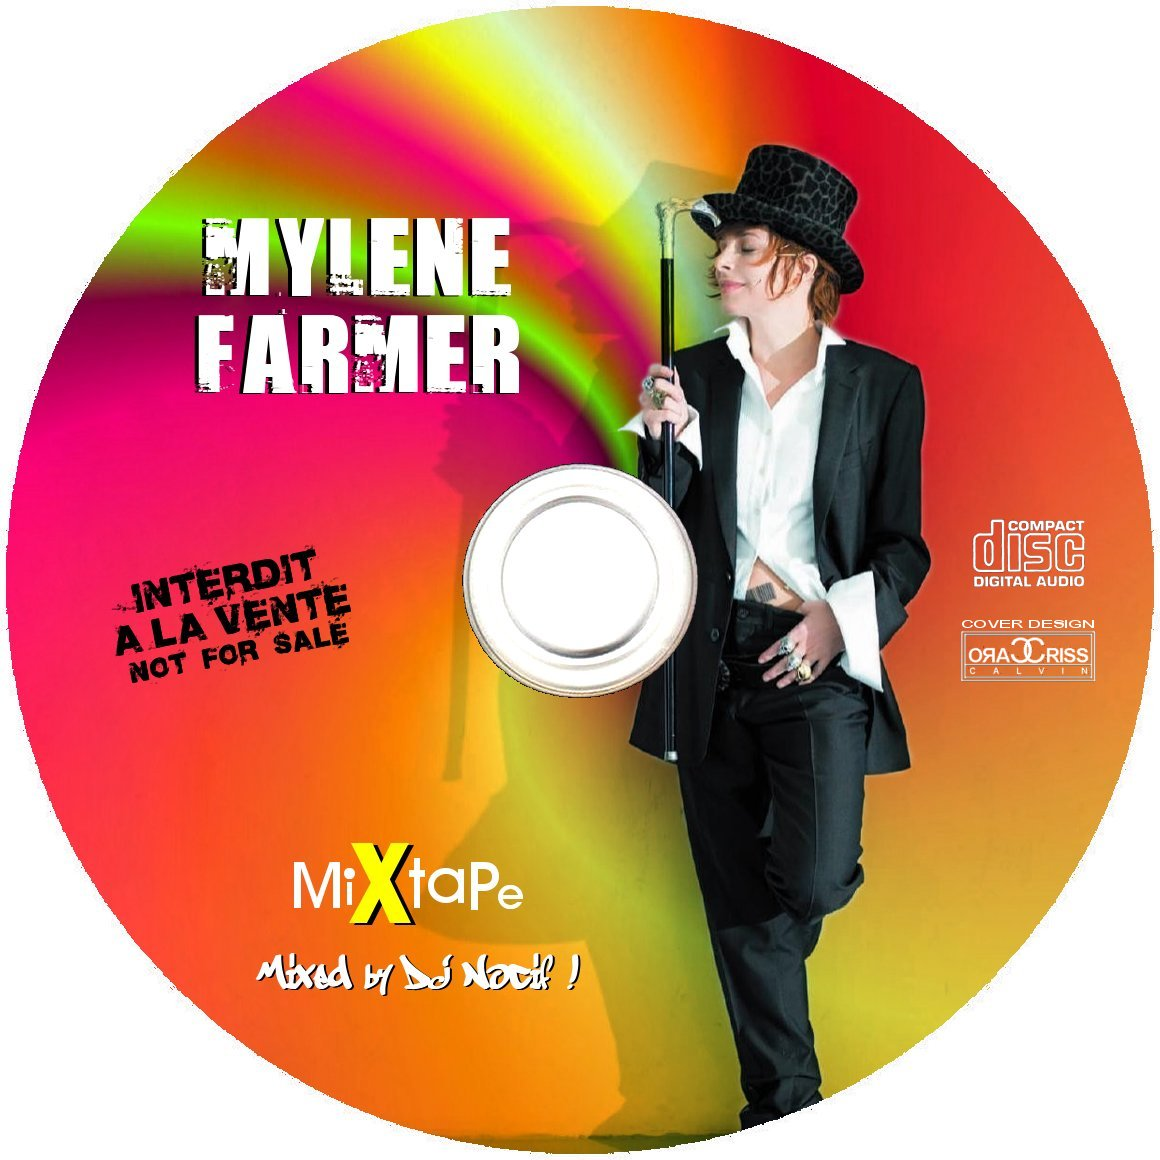 http://3.bp.blogspot.com/-IFDW2FO-UQA/T8Ft69sMN6I/AAAAAAAAAN0/xsfrUV2qFa8/s1600/Mylene+Farmer+-+MiXtape+%28Cd%29.jpg